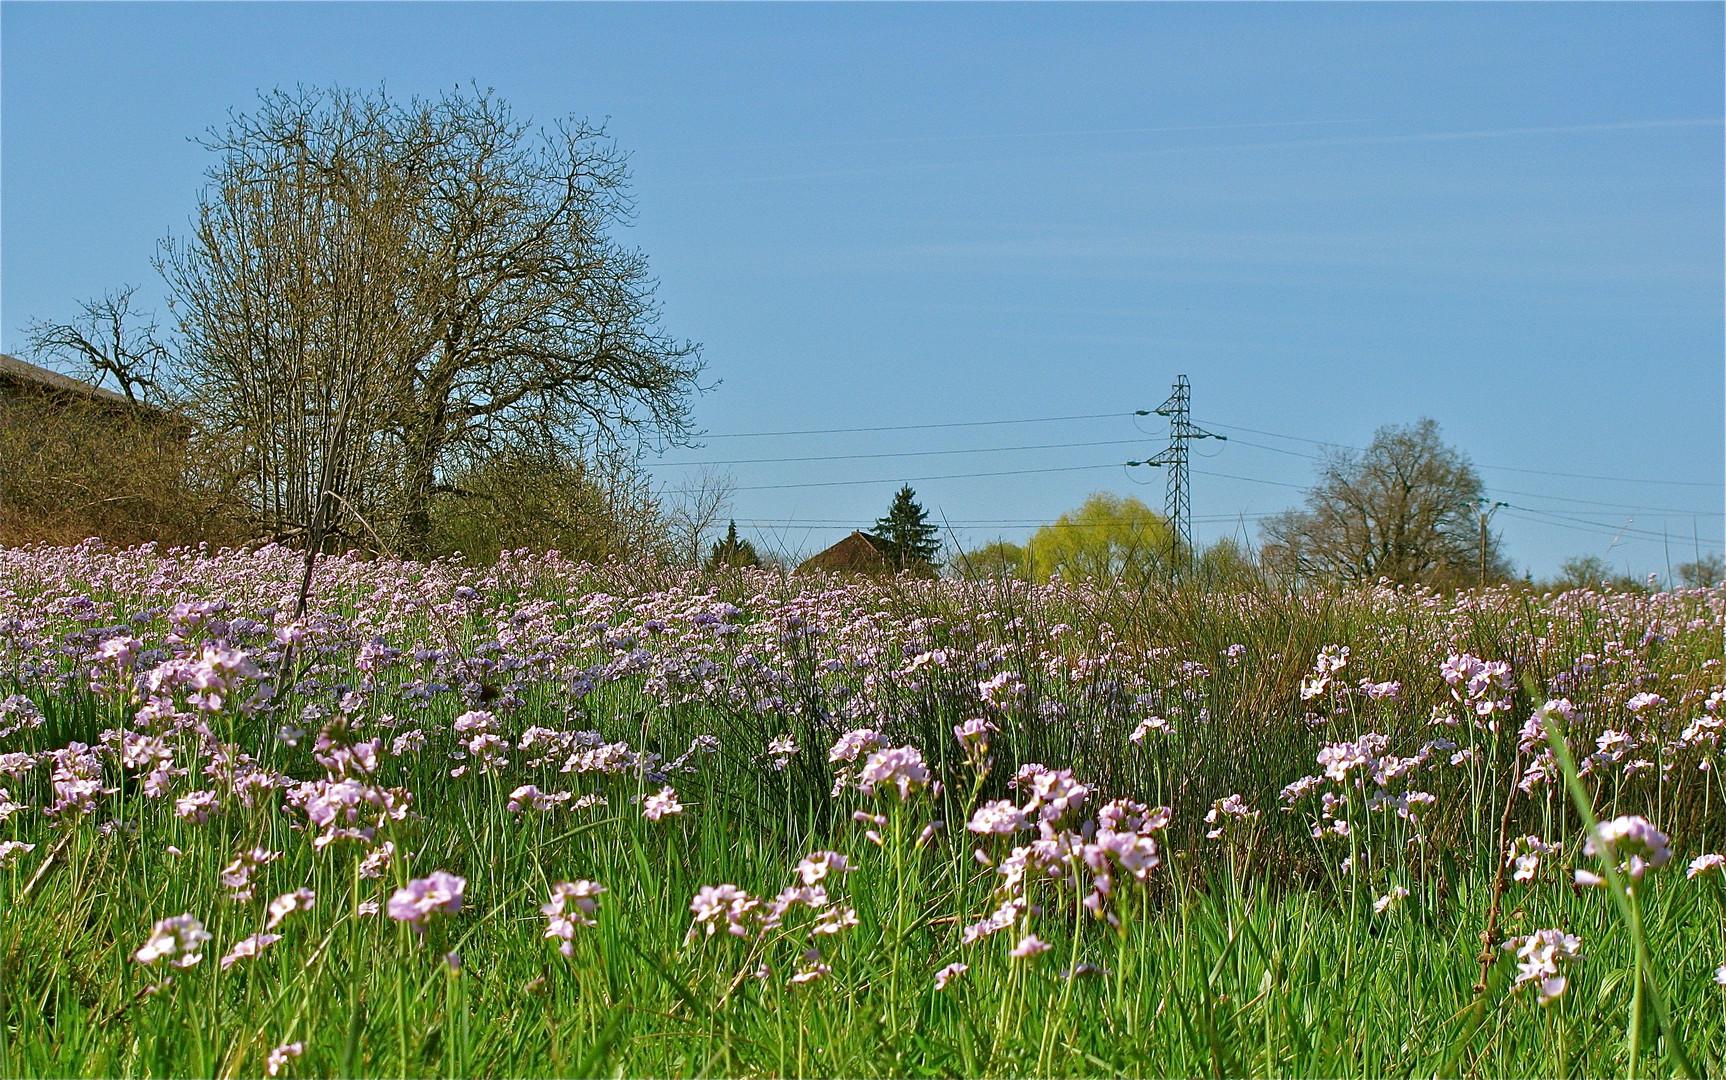 ...Vive le printemps 1 !!!..